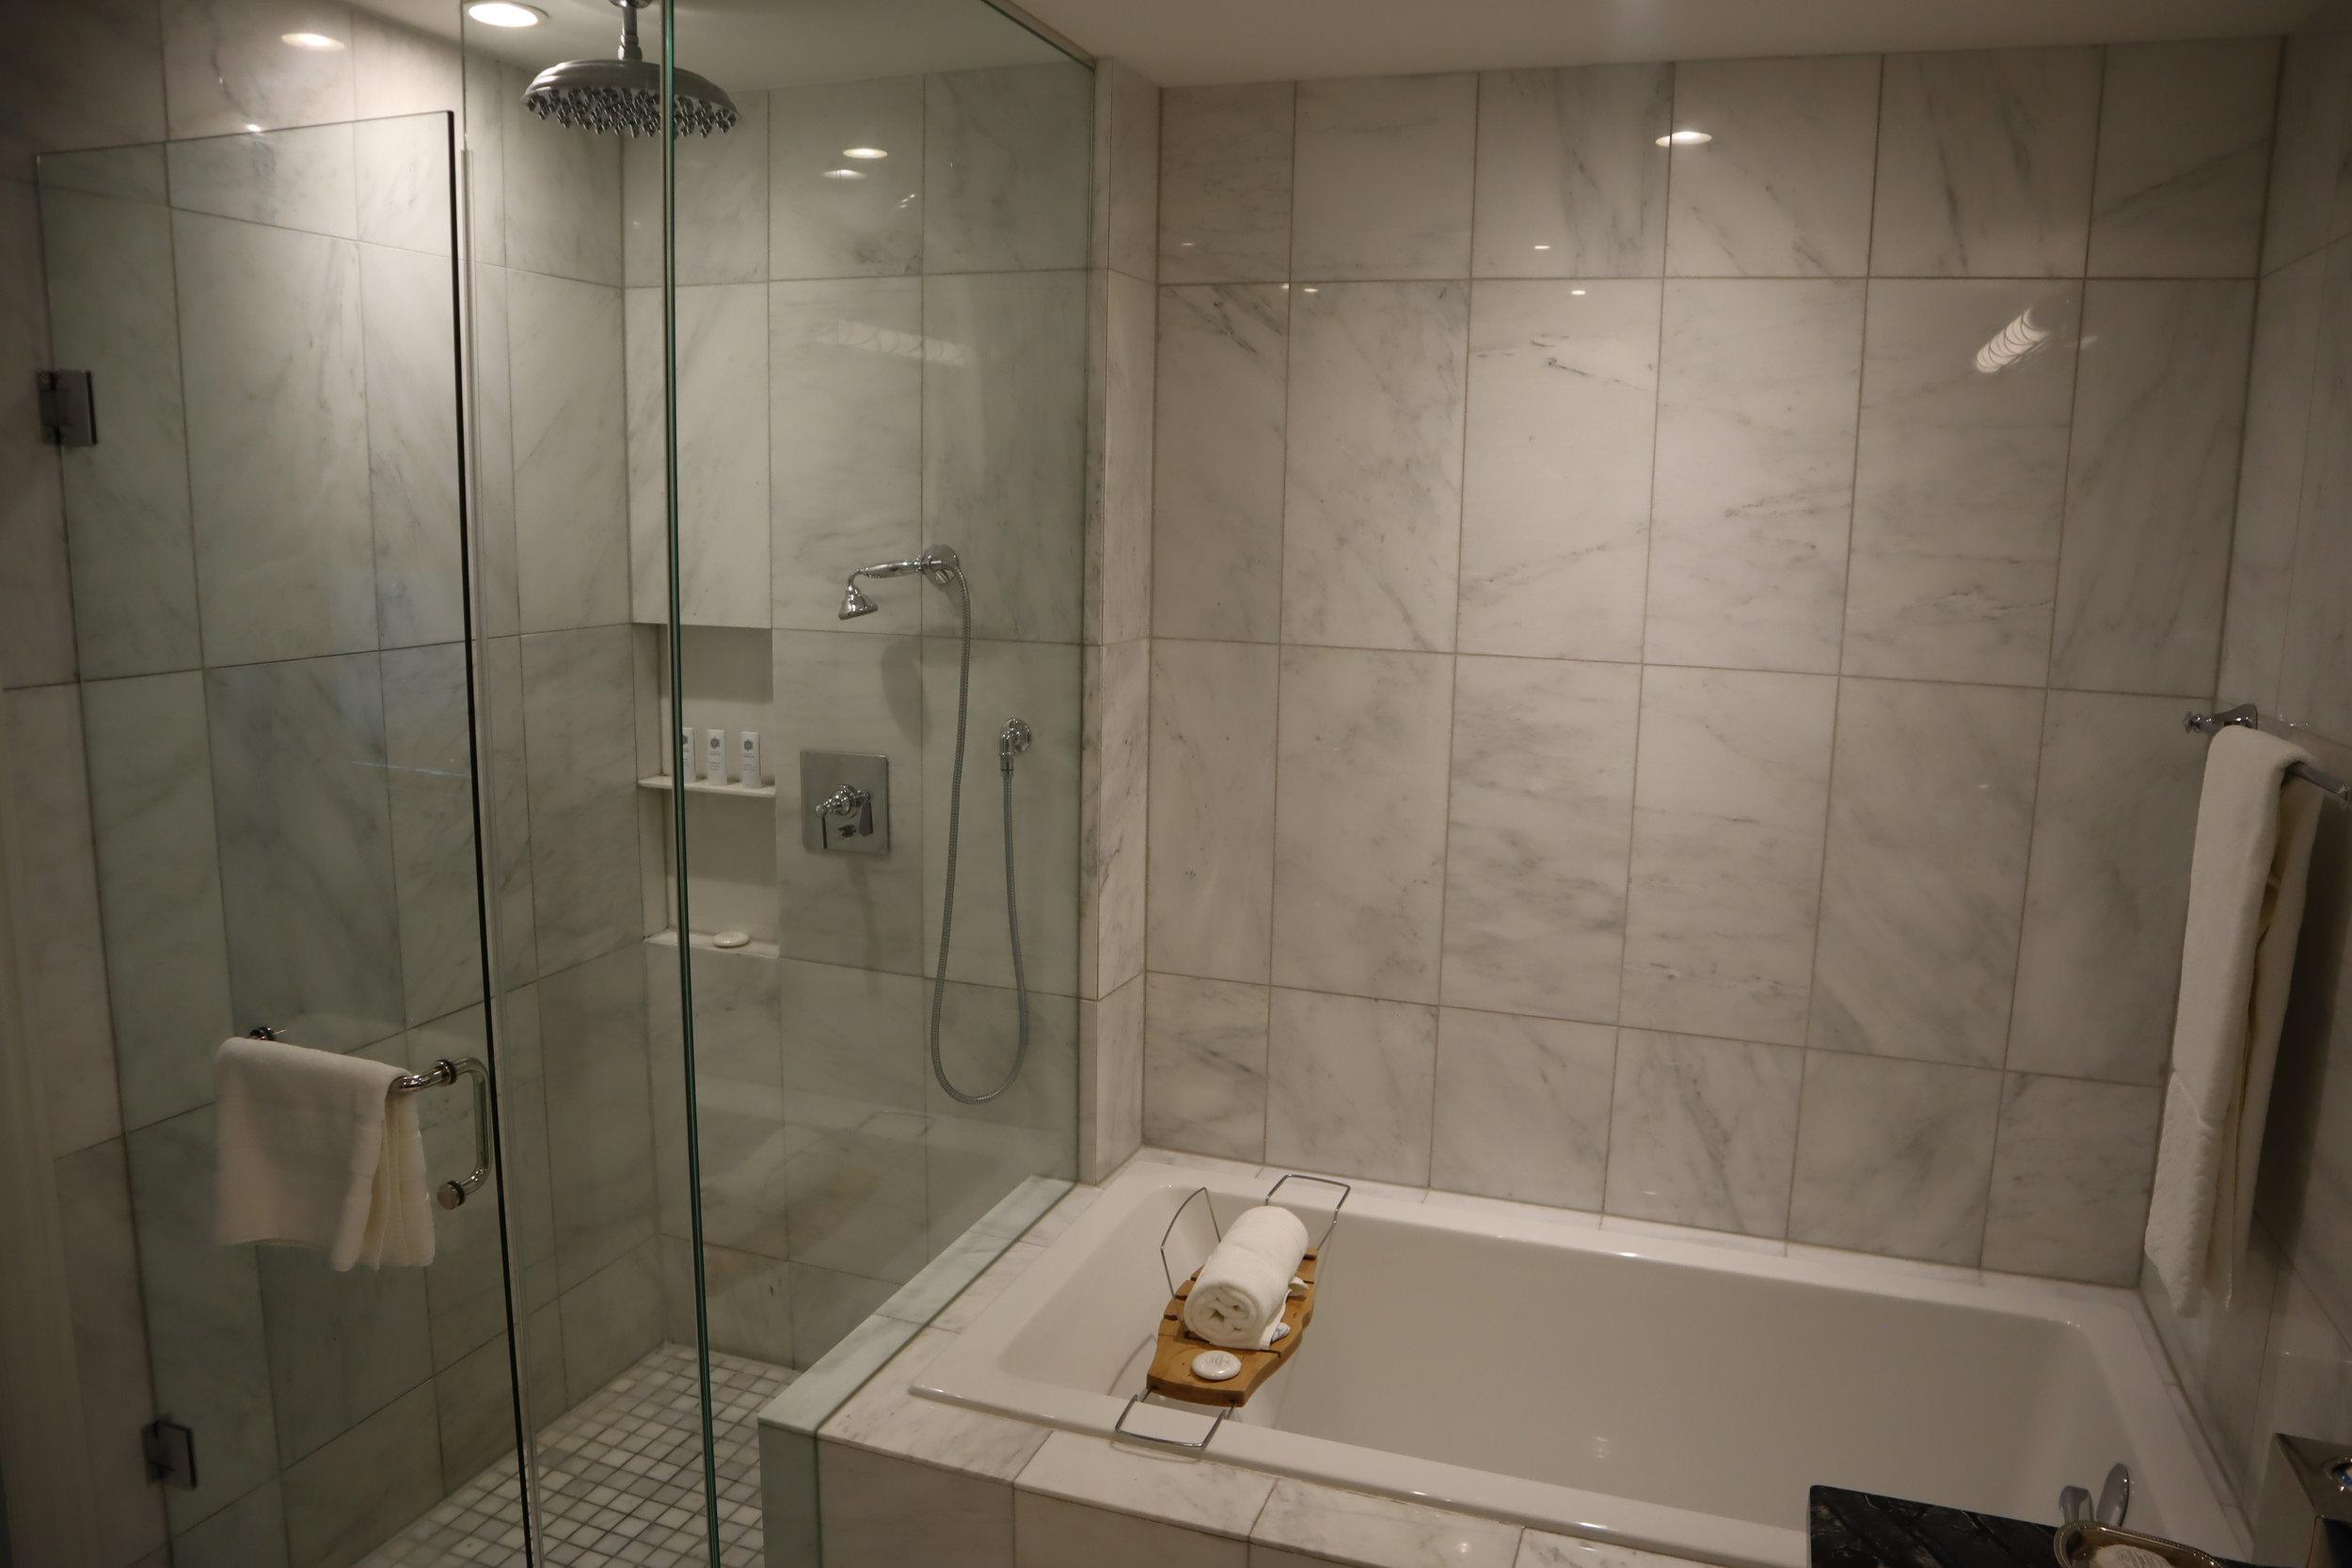 St. Regis Toronto – Two-bedroom suite master bathroom shower & tub